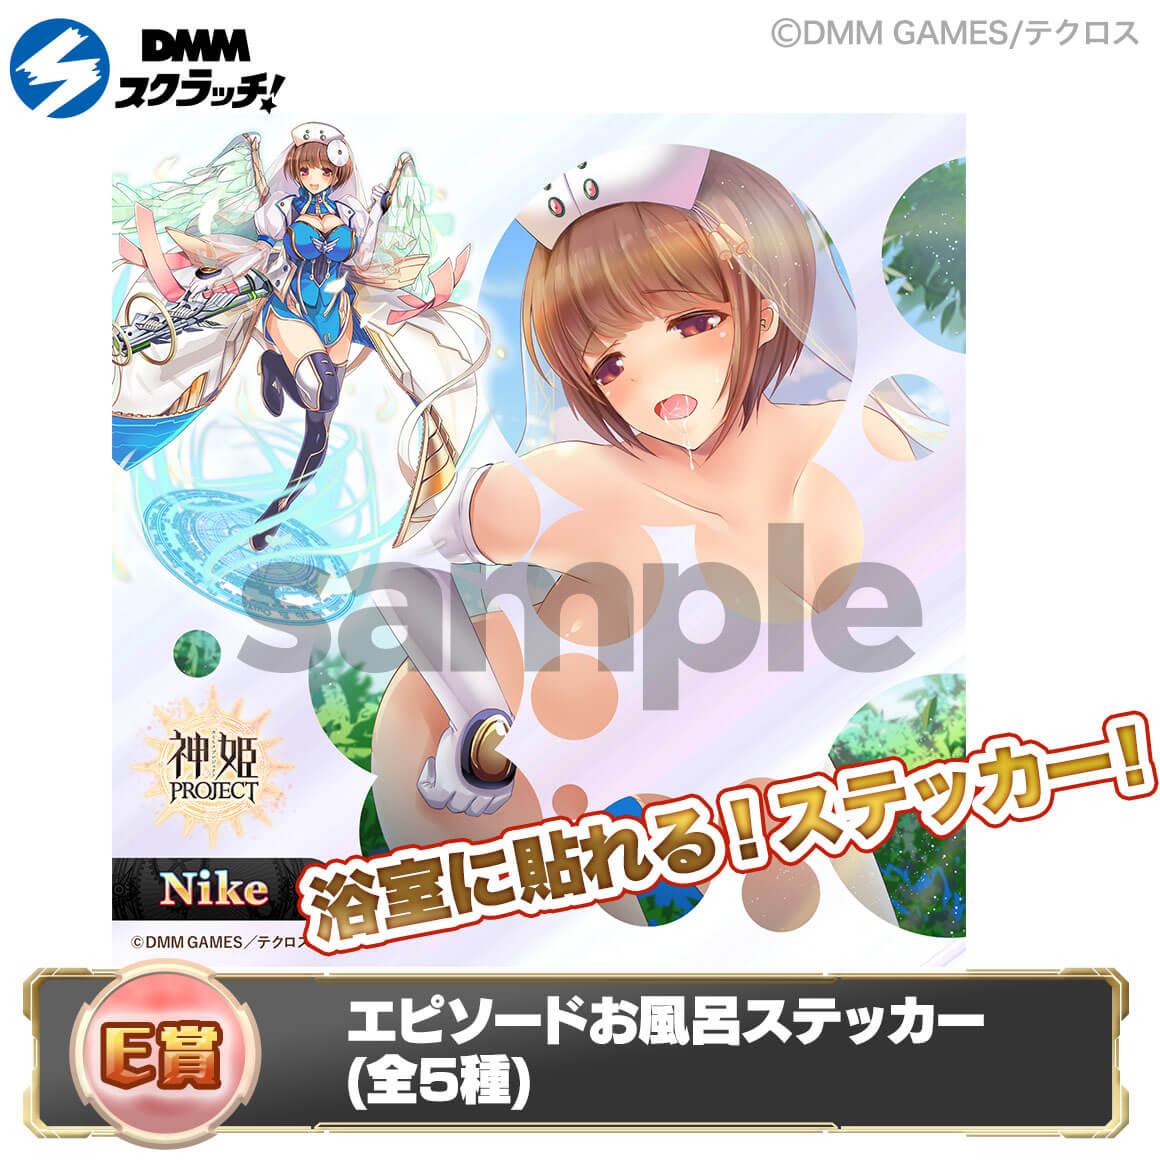 【IP表示無】神姫PROJECT part41【DMM.18】 [無断転載禁止]©bbspink.com->画像>283枚